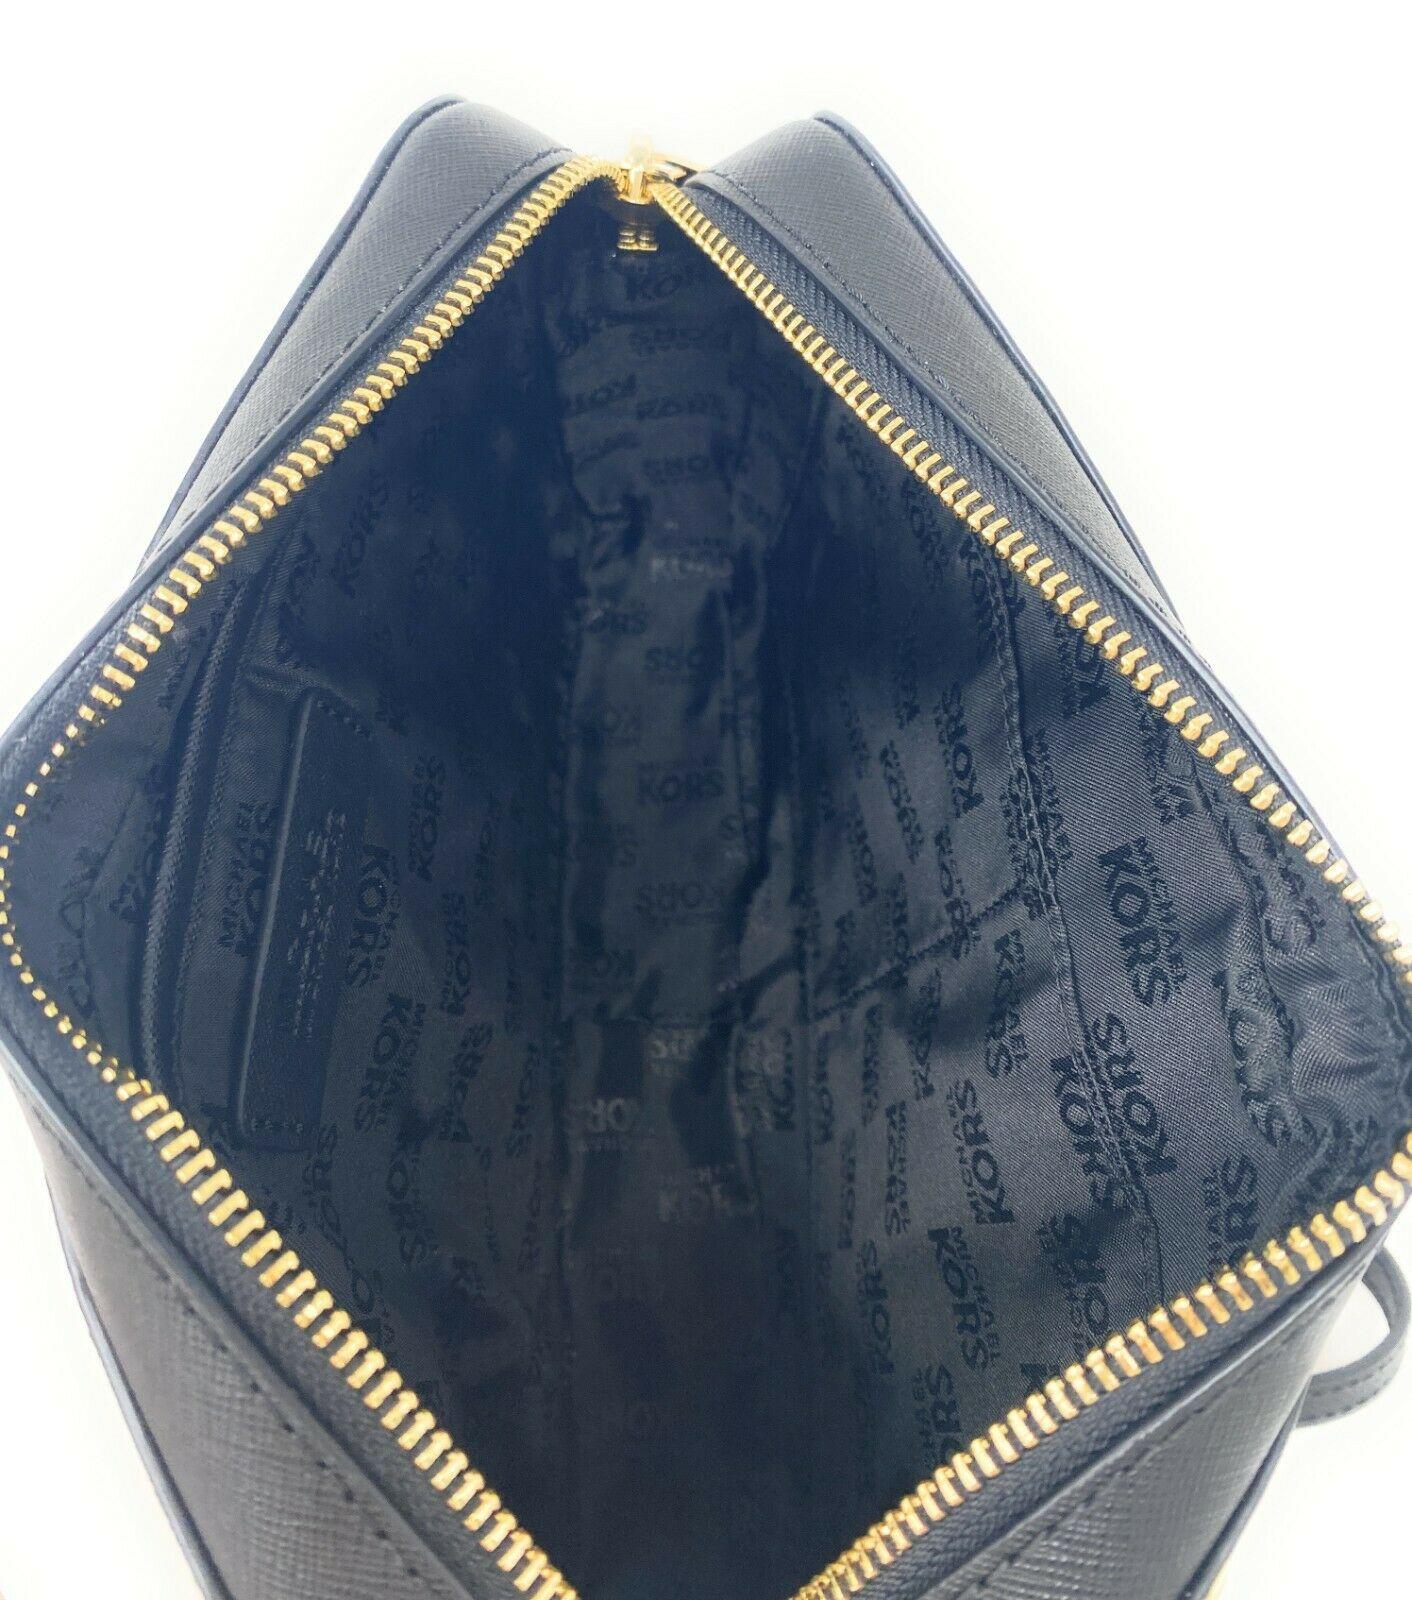 thumbnail 55 - Michael Kors Jet Set Item Large East West Crossbody Chain Handbag Clutch $298